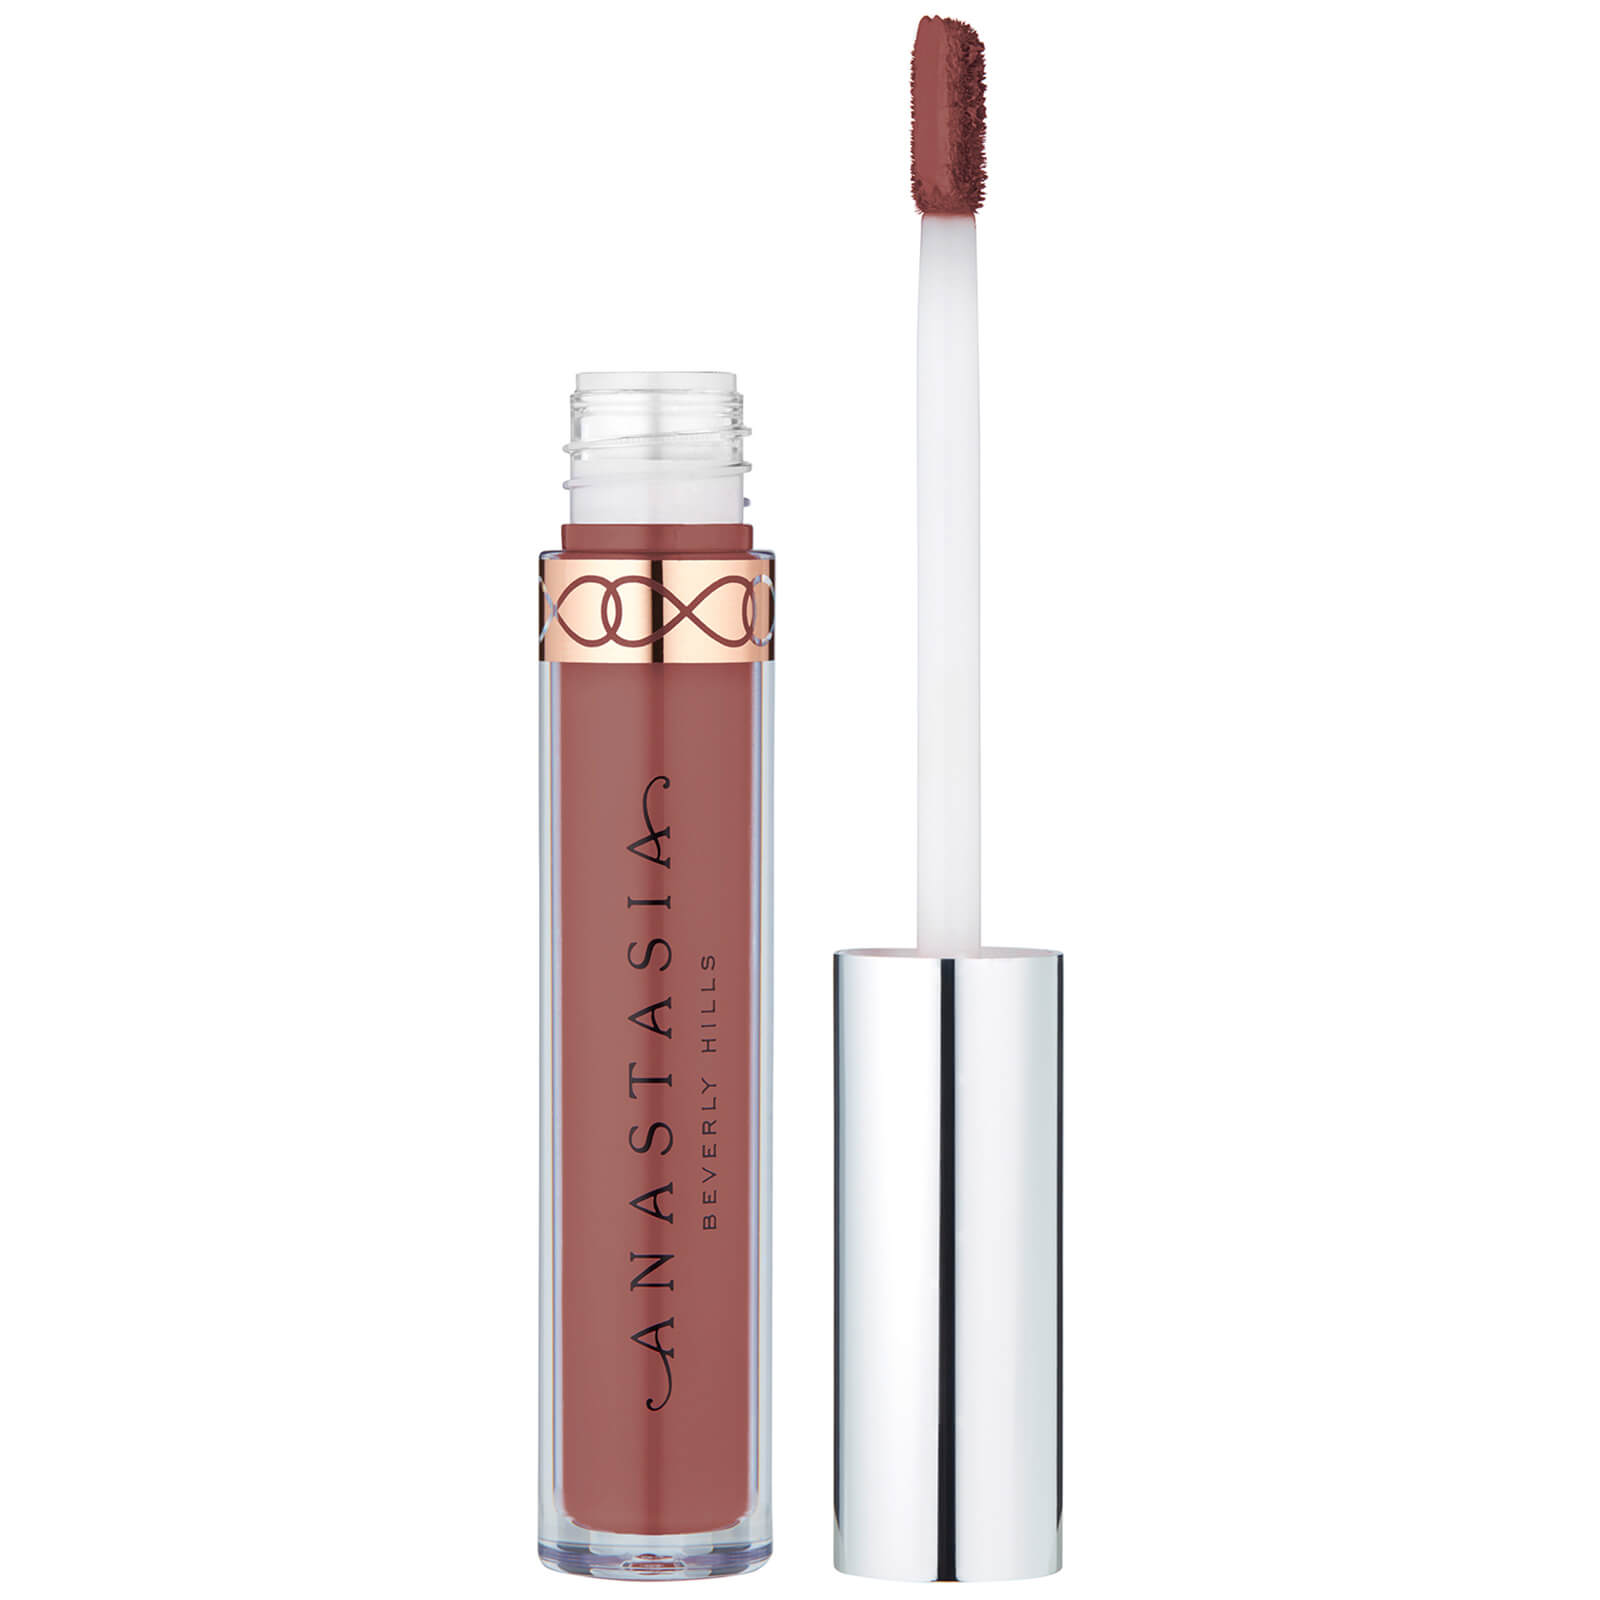 Anastasia Beverly Hills Liquid Lipstick 3.2g (Various Shades) - Hudson